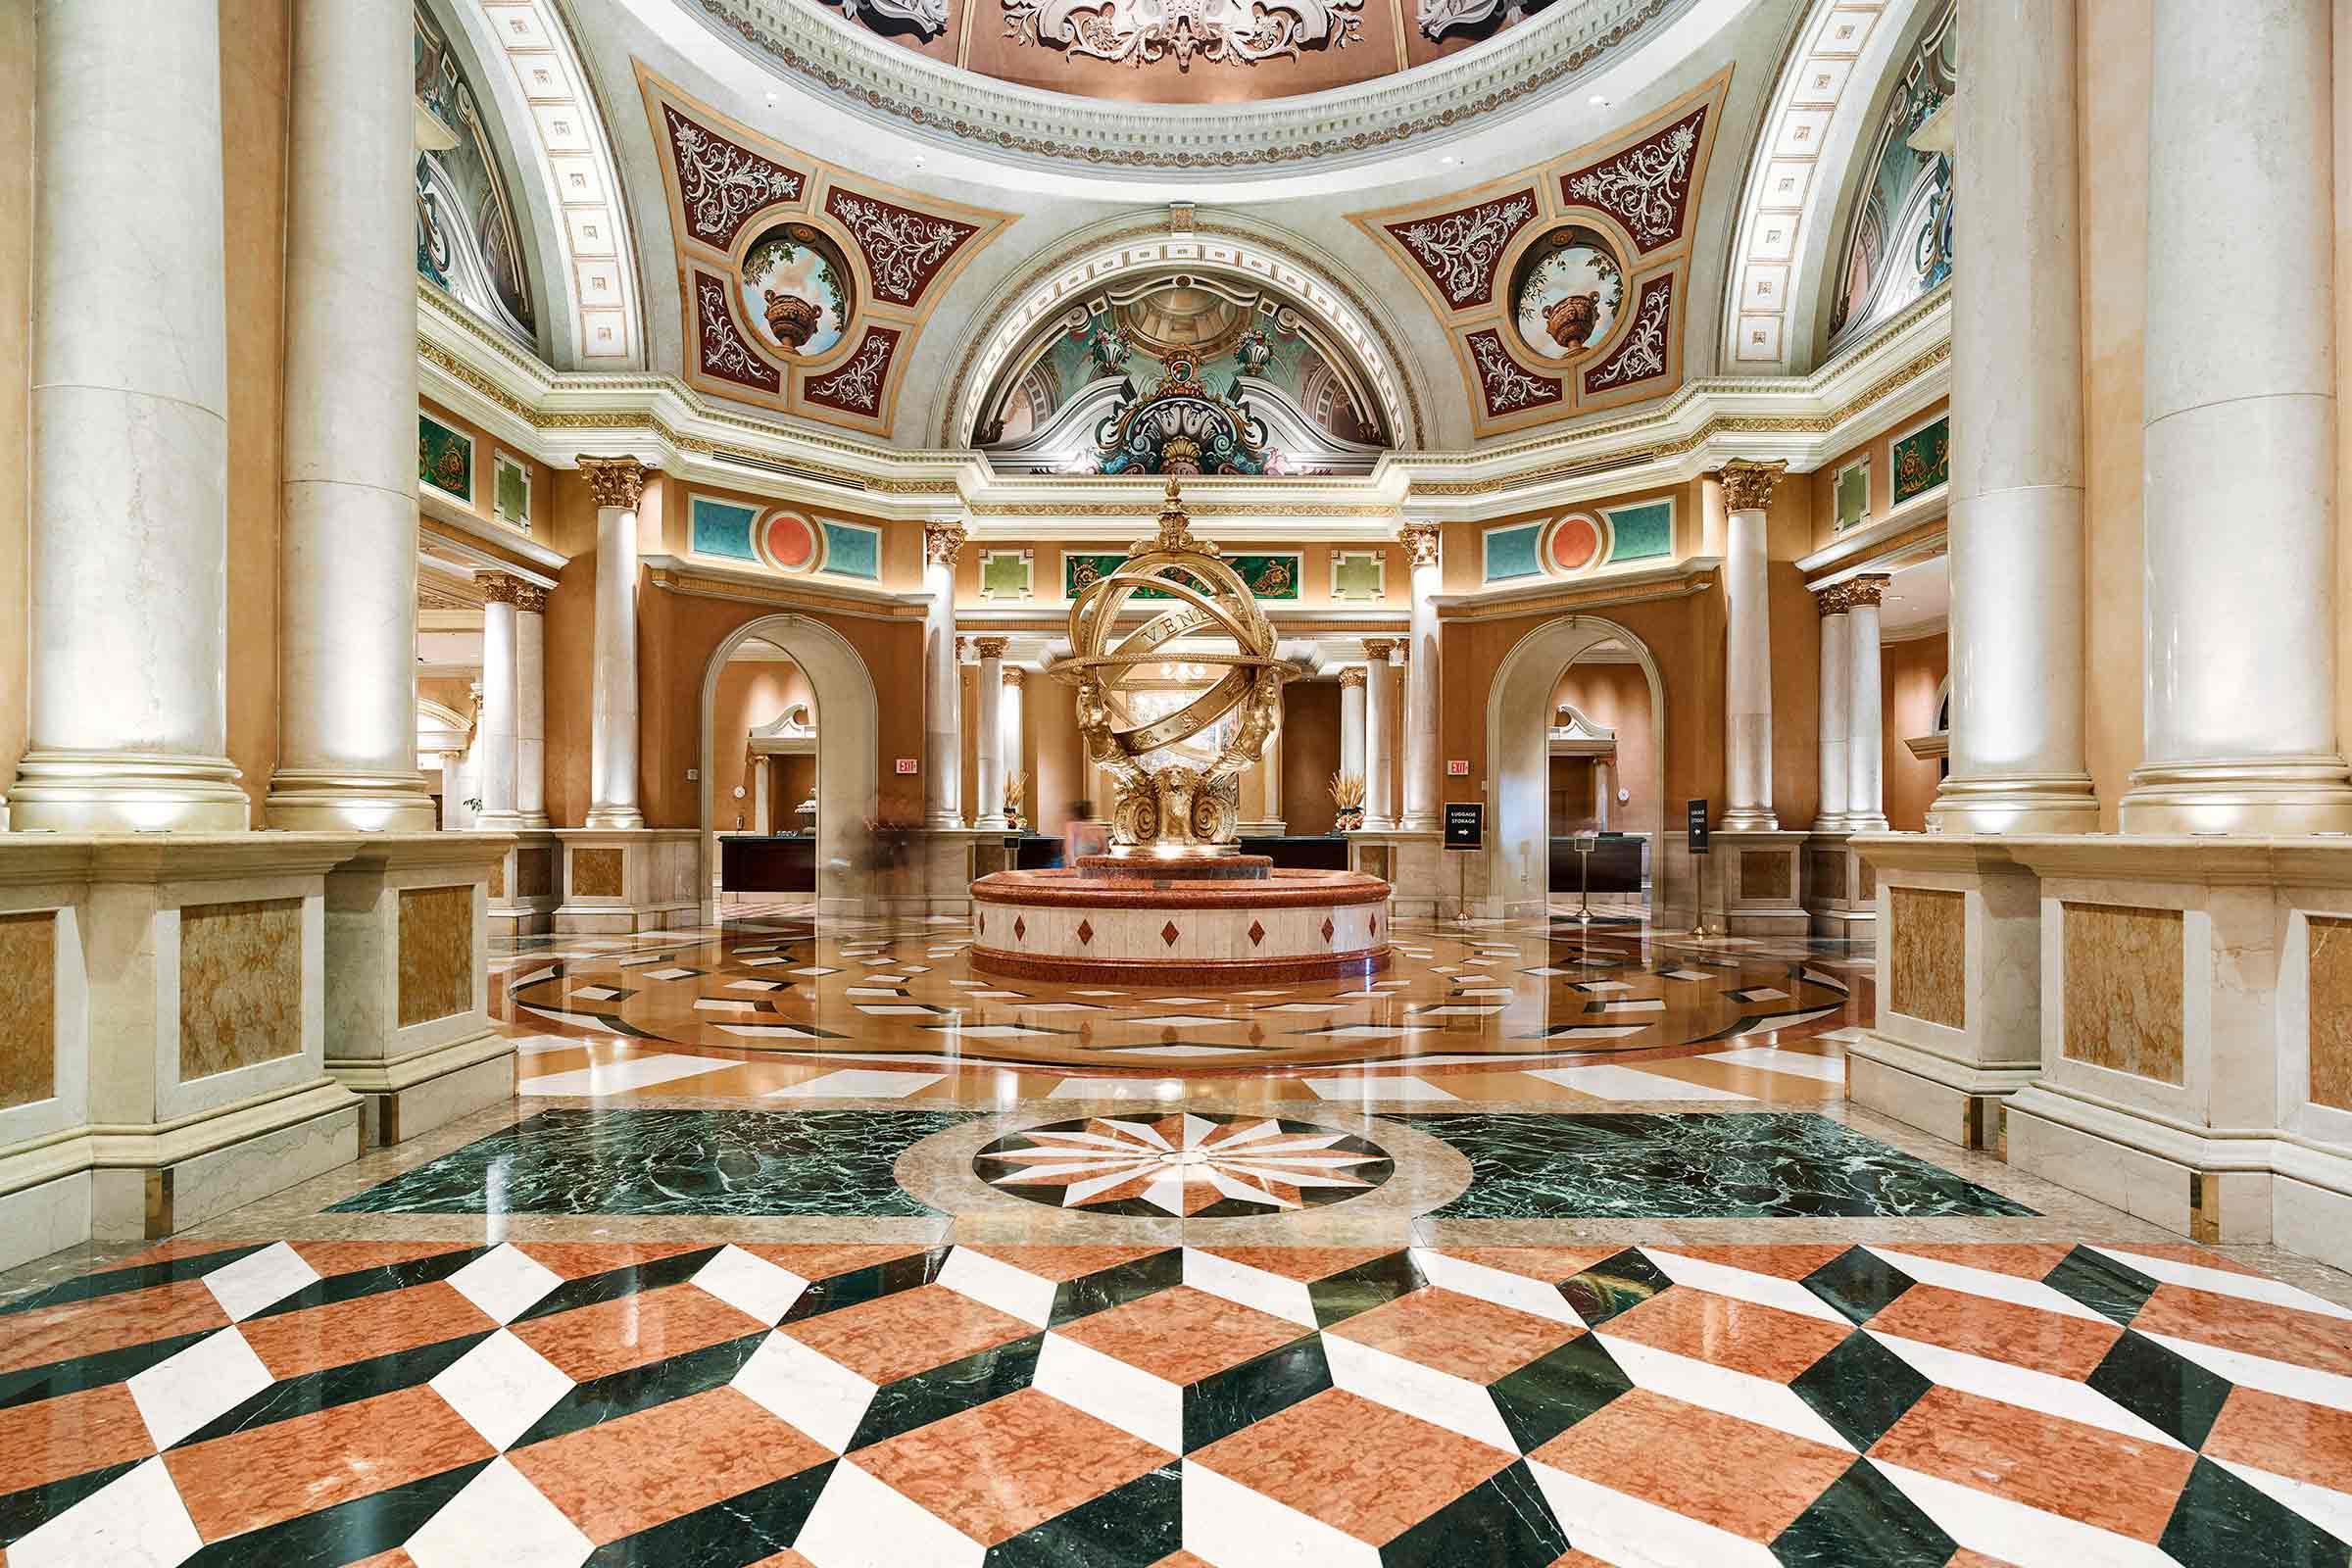 The venetian las vegas hotel deals - Venetian Resort Armillary_2400x1600